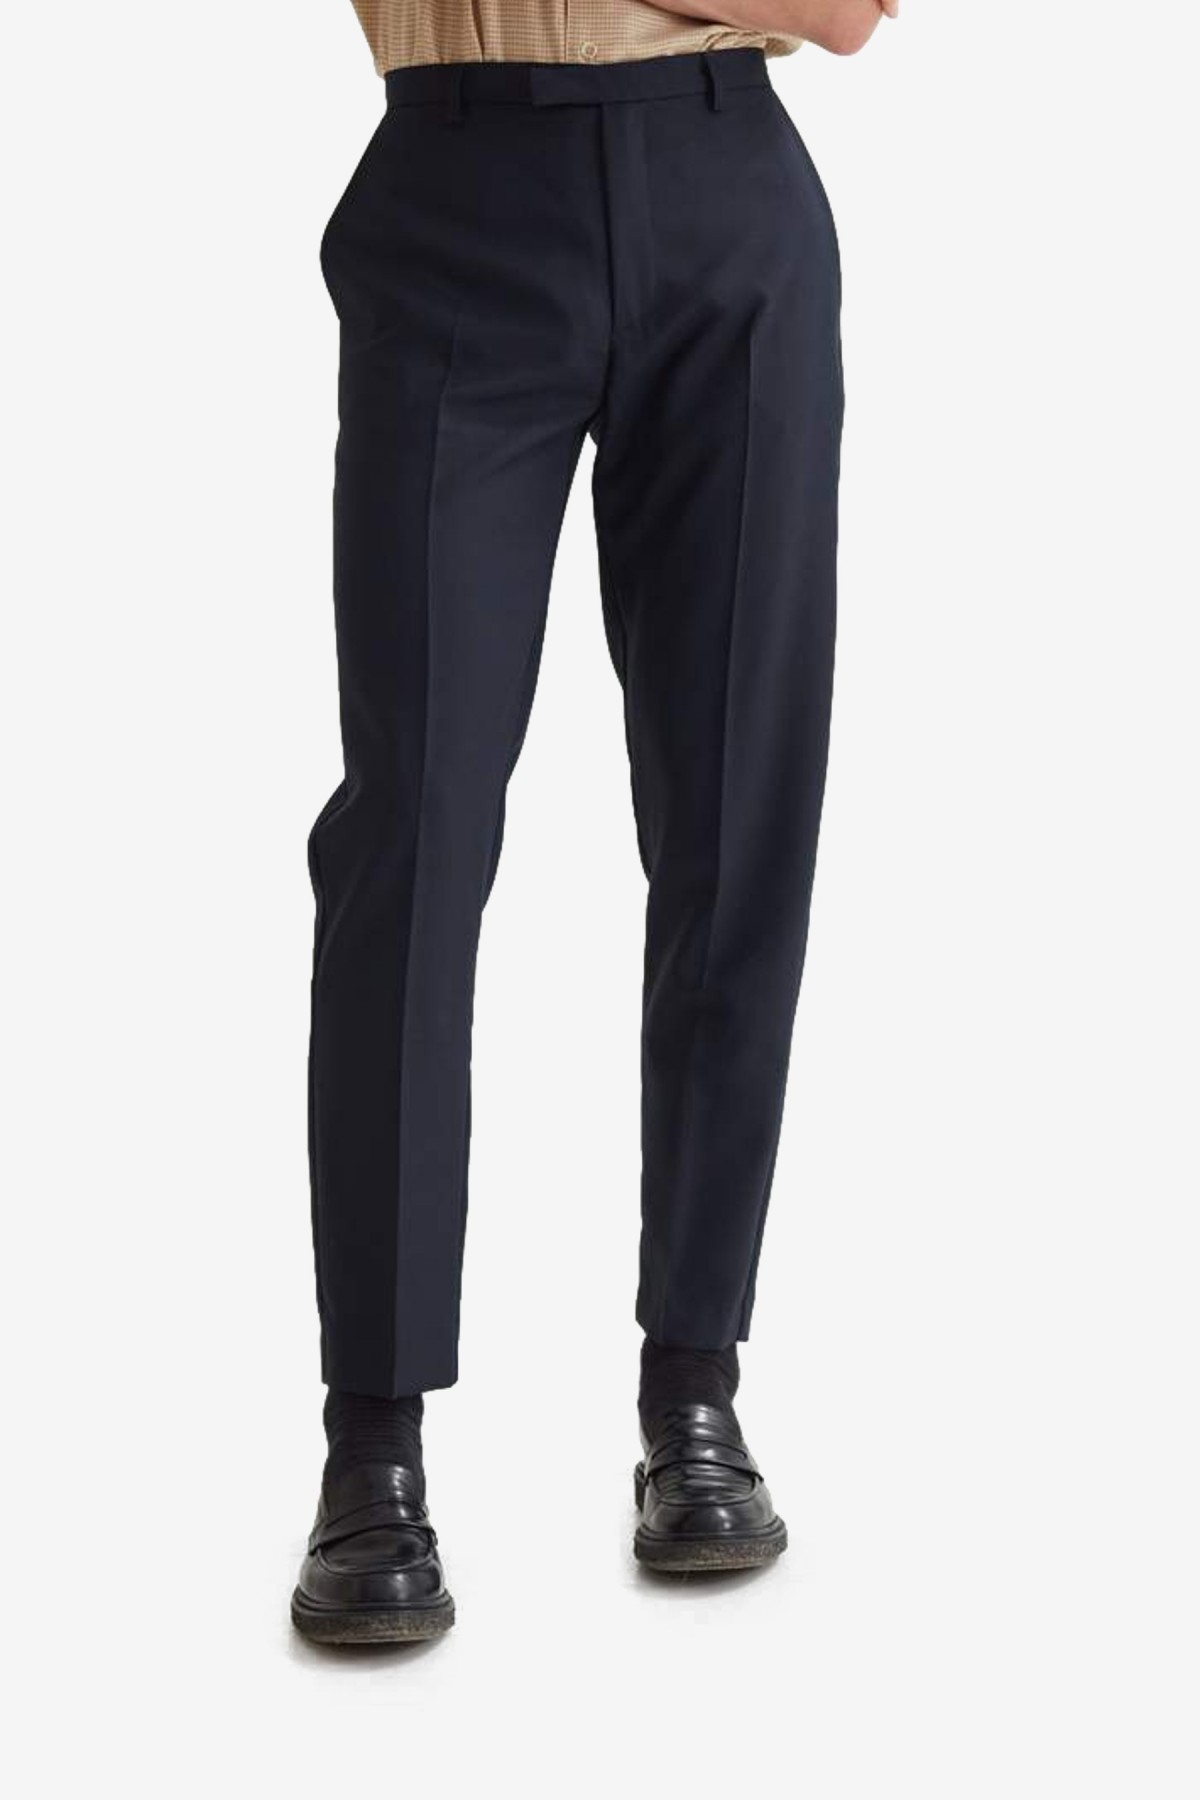 Séfr Harvey Suit Trousers in Dark Navy